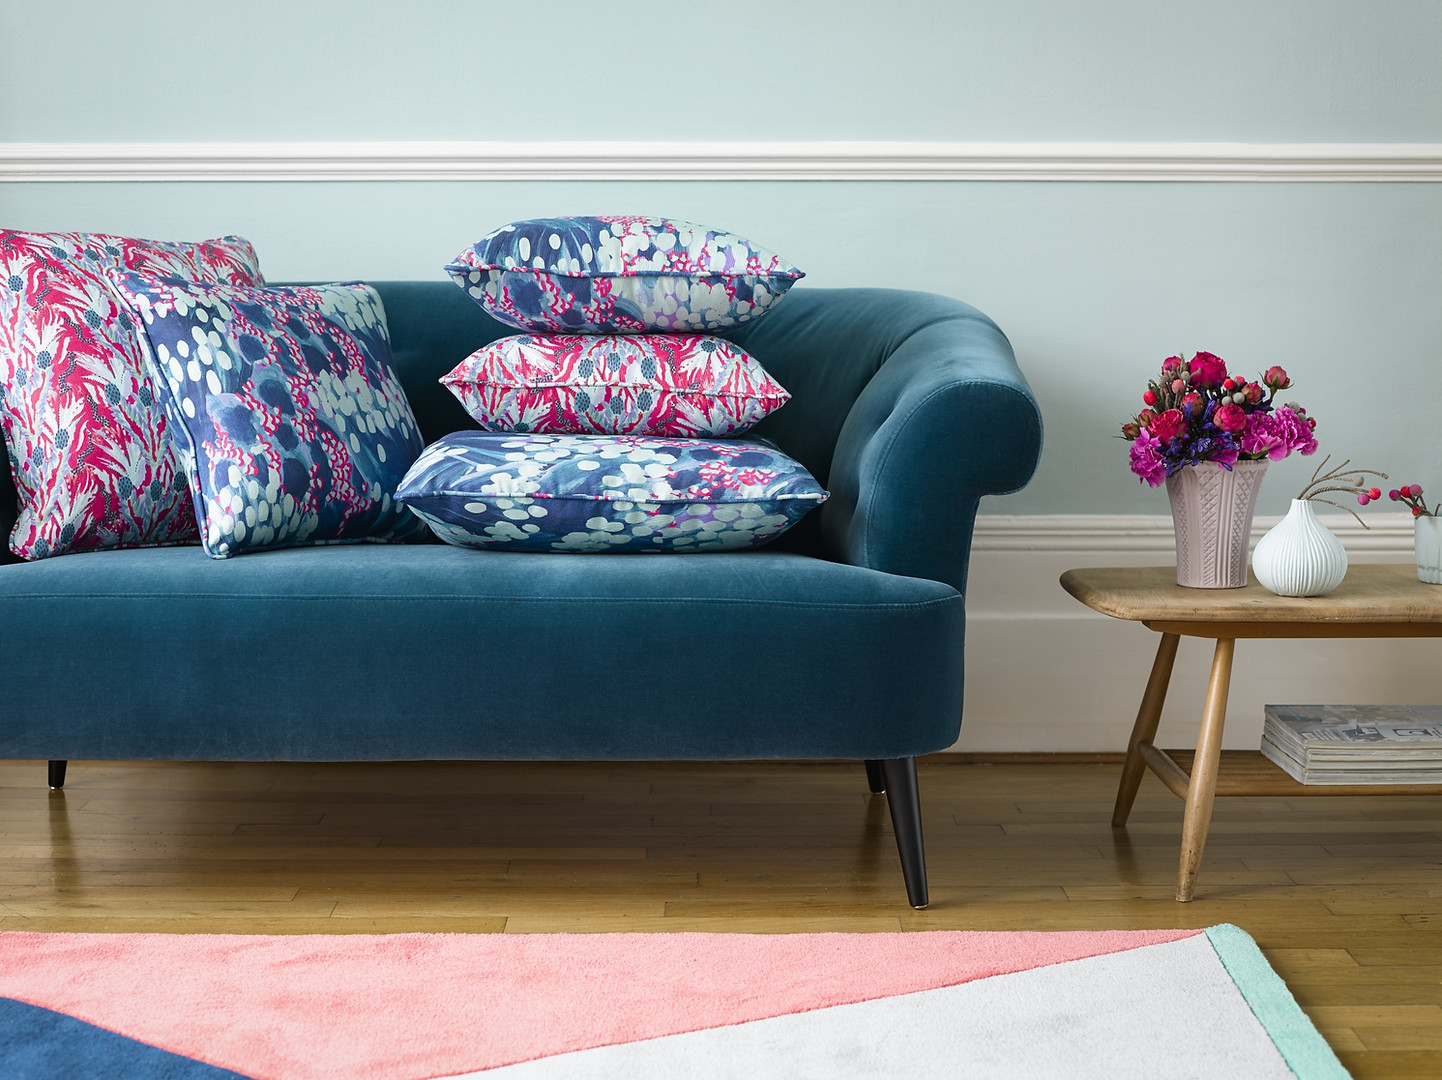 Sofa.com cushions